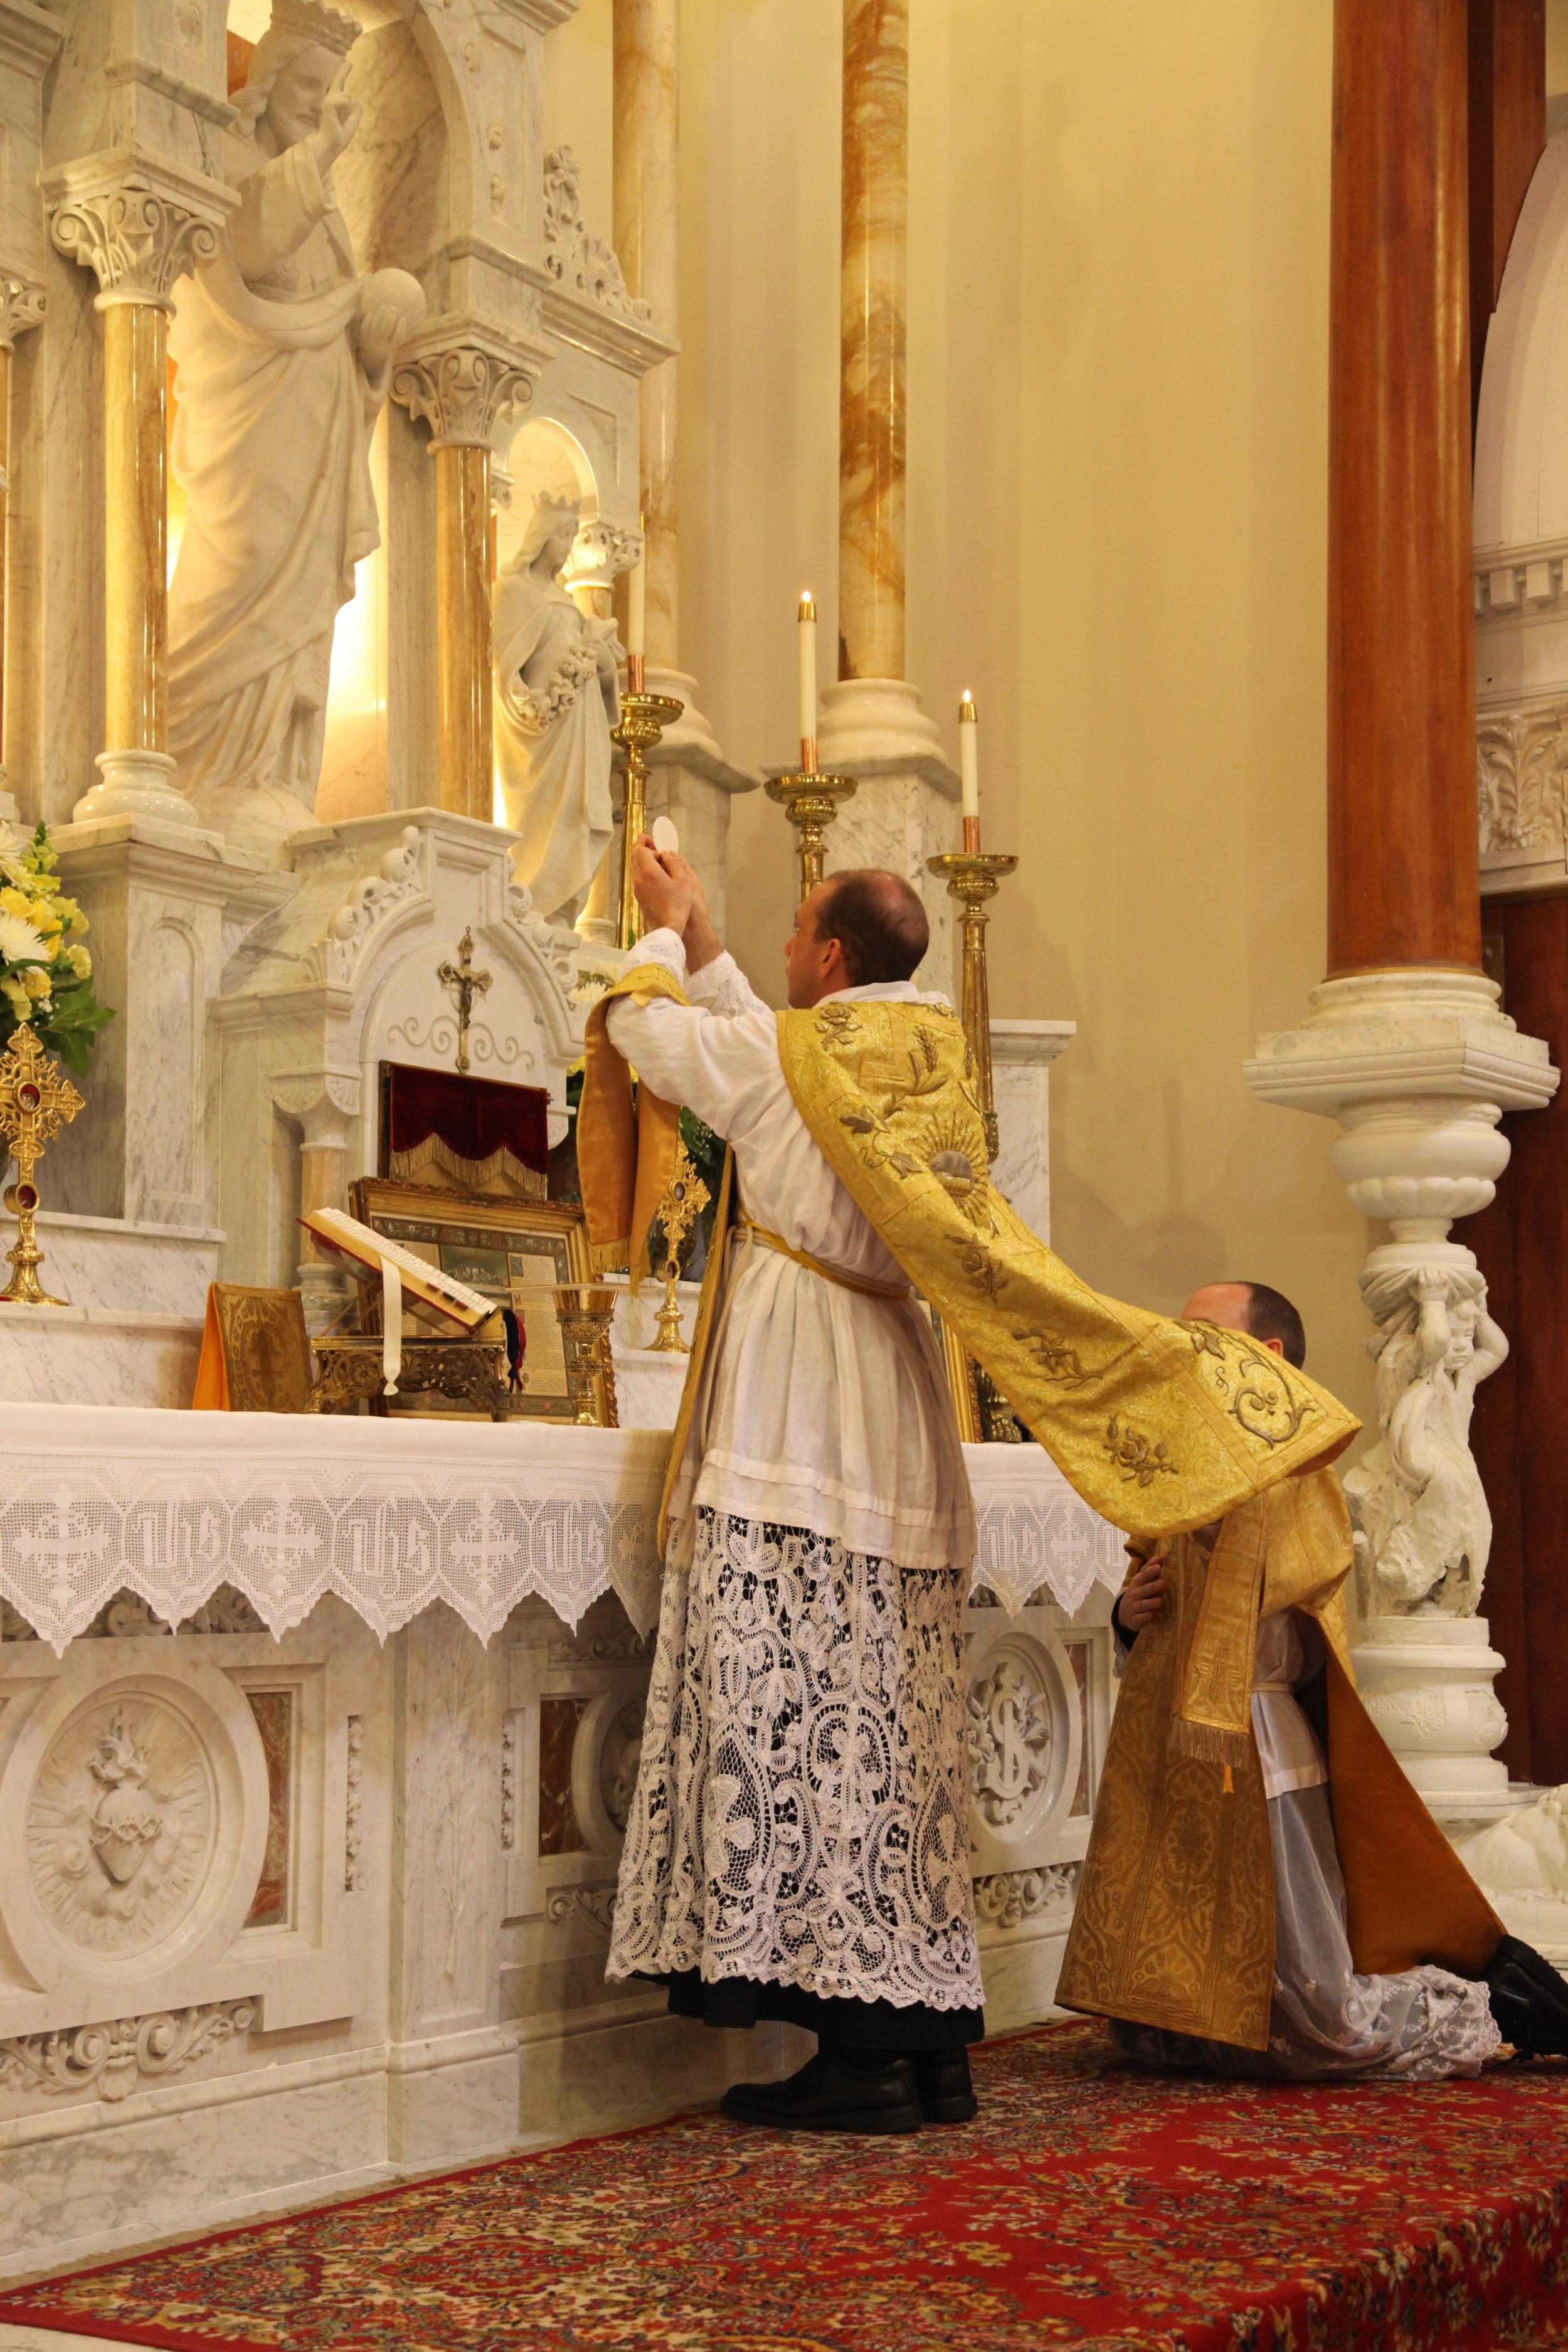 Fr_Thomas_Offers_Mass.JPG